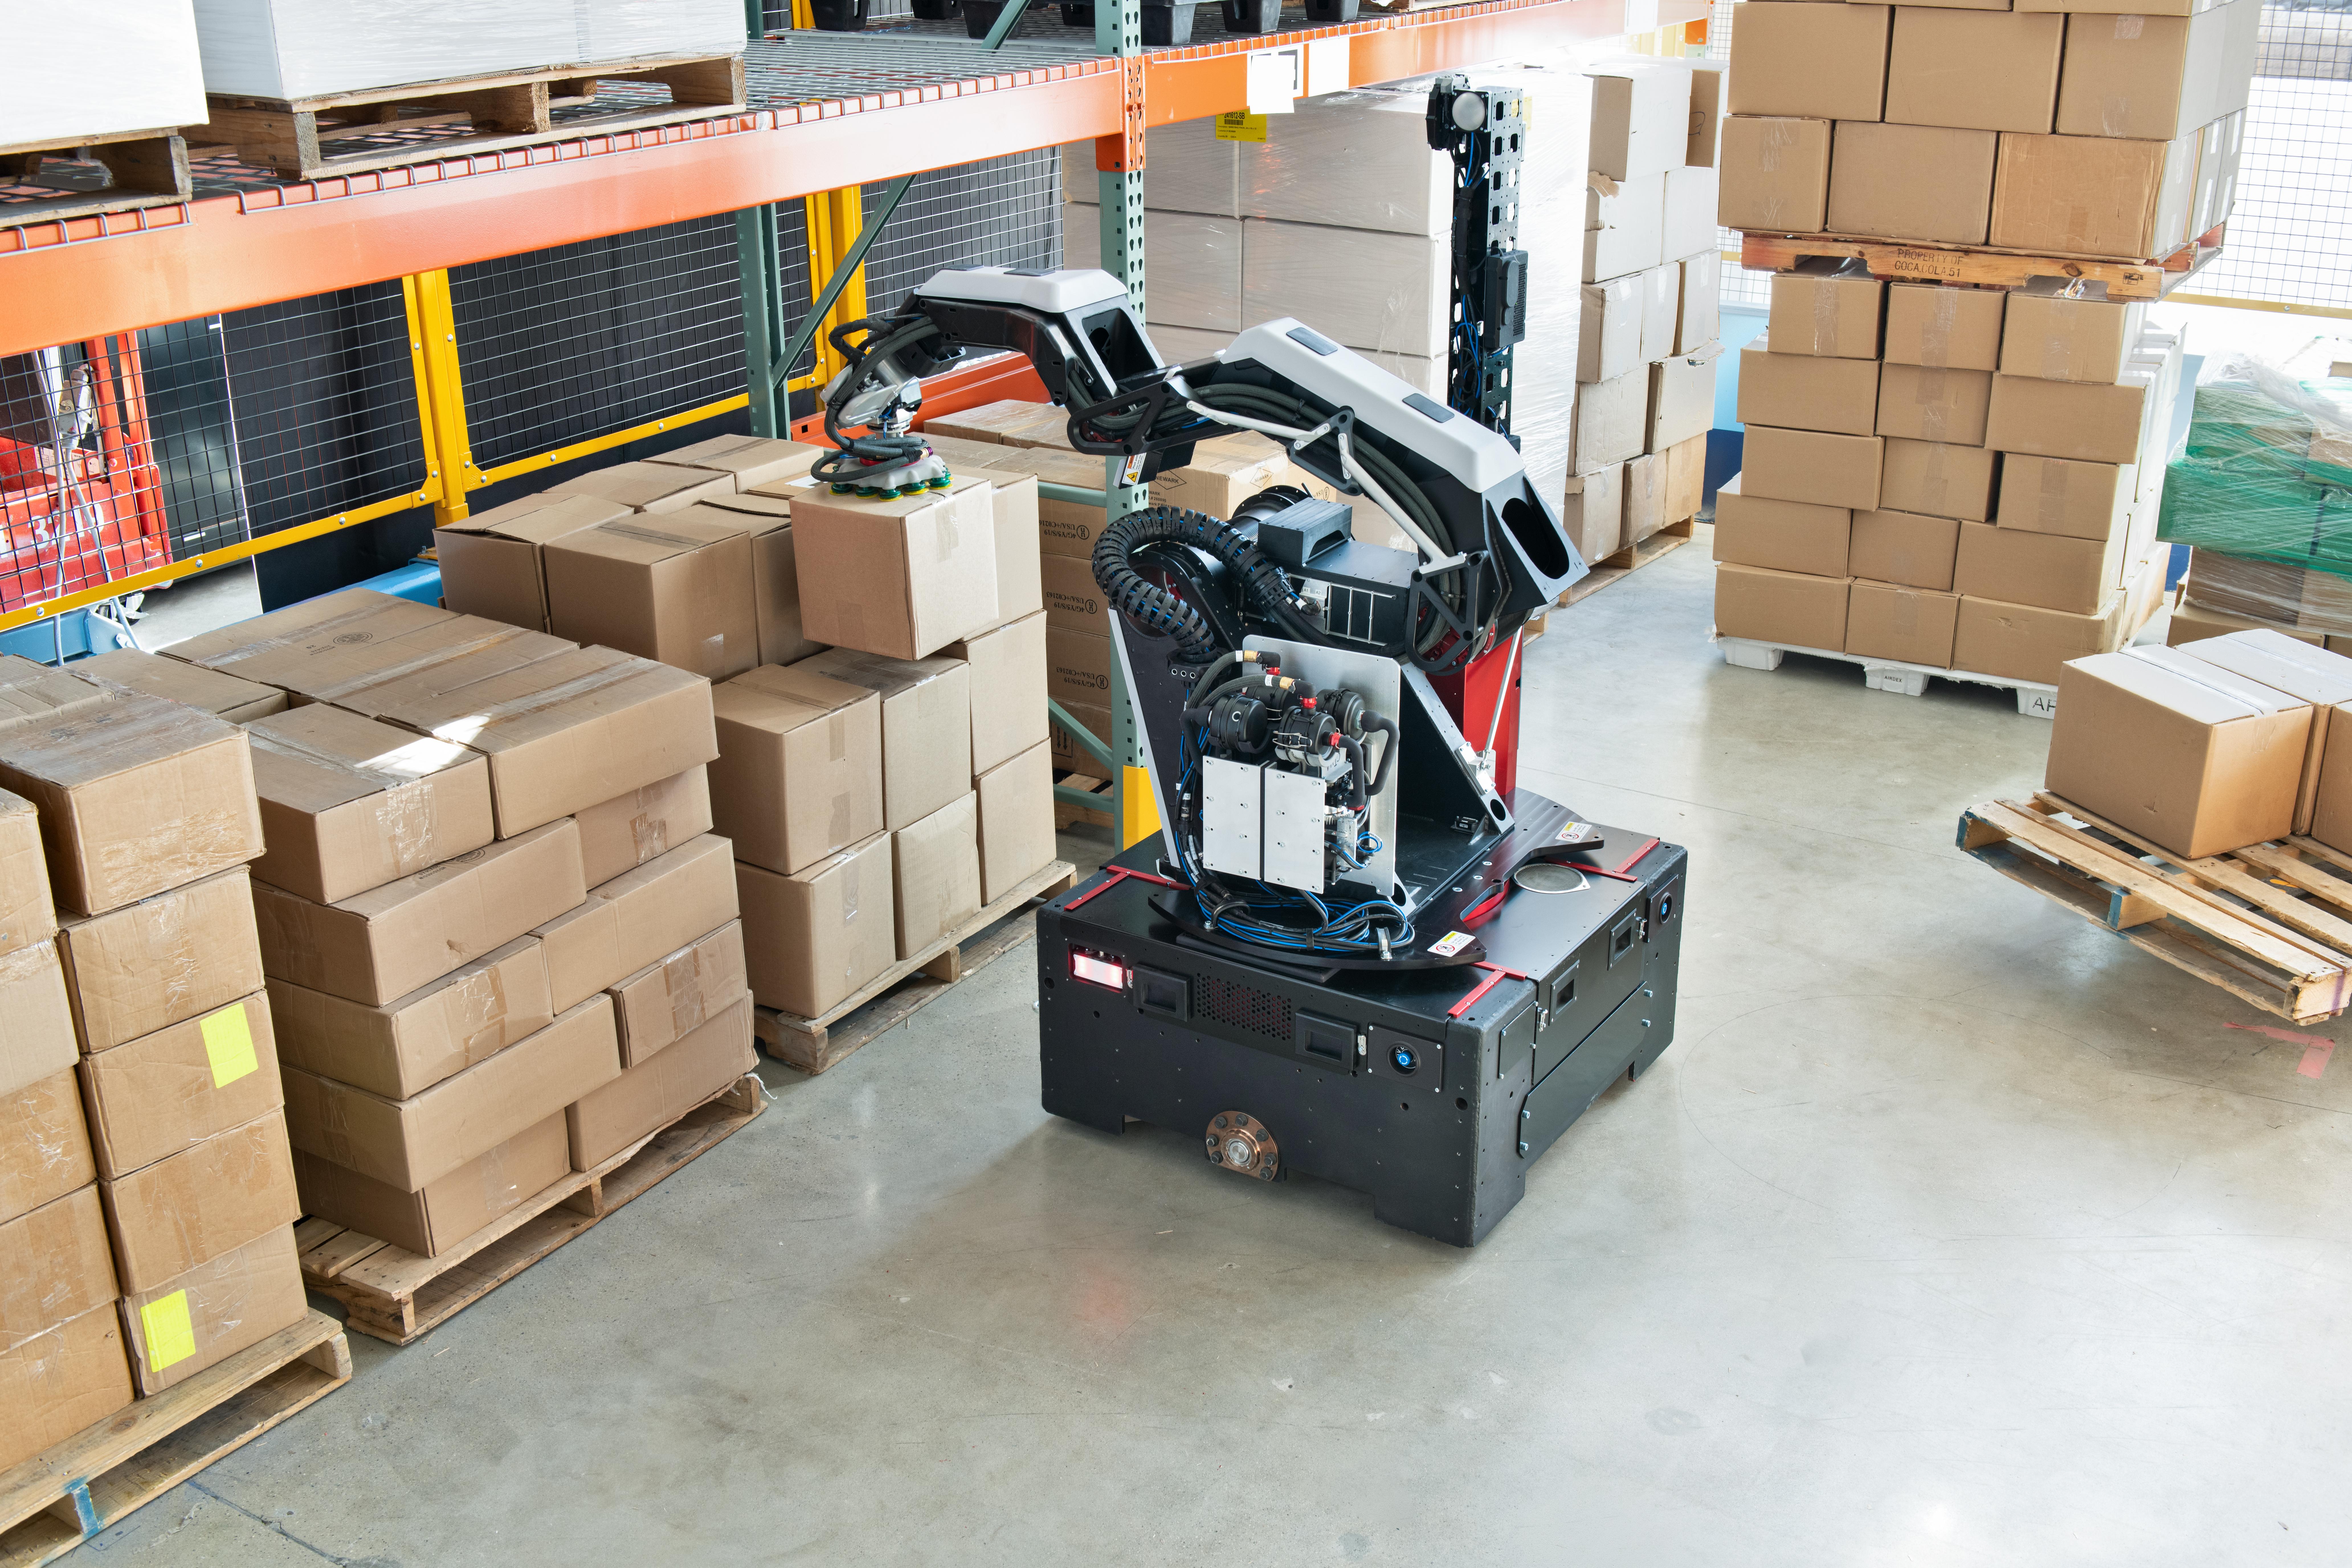 Stretch - новый складской робот от Boston Dynamics